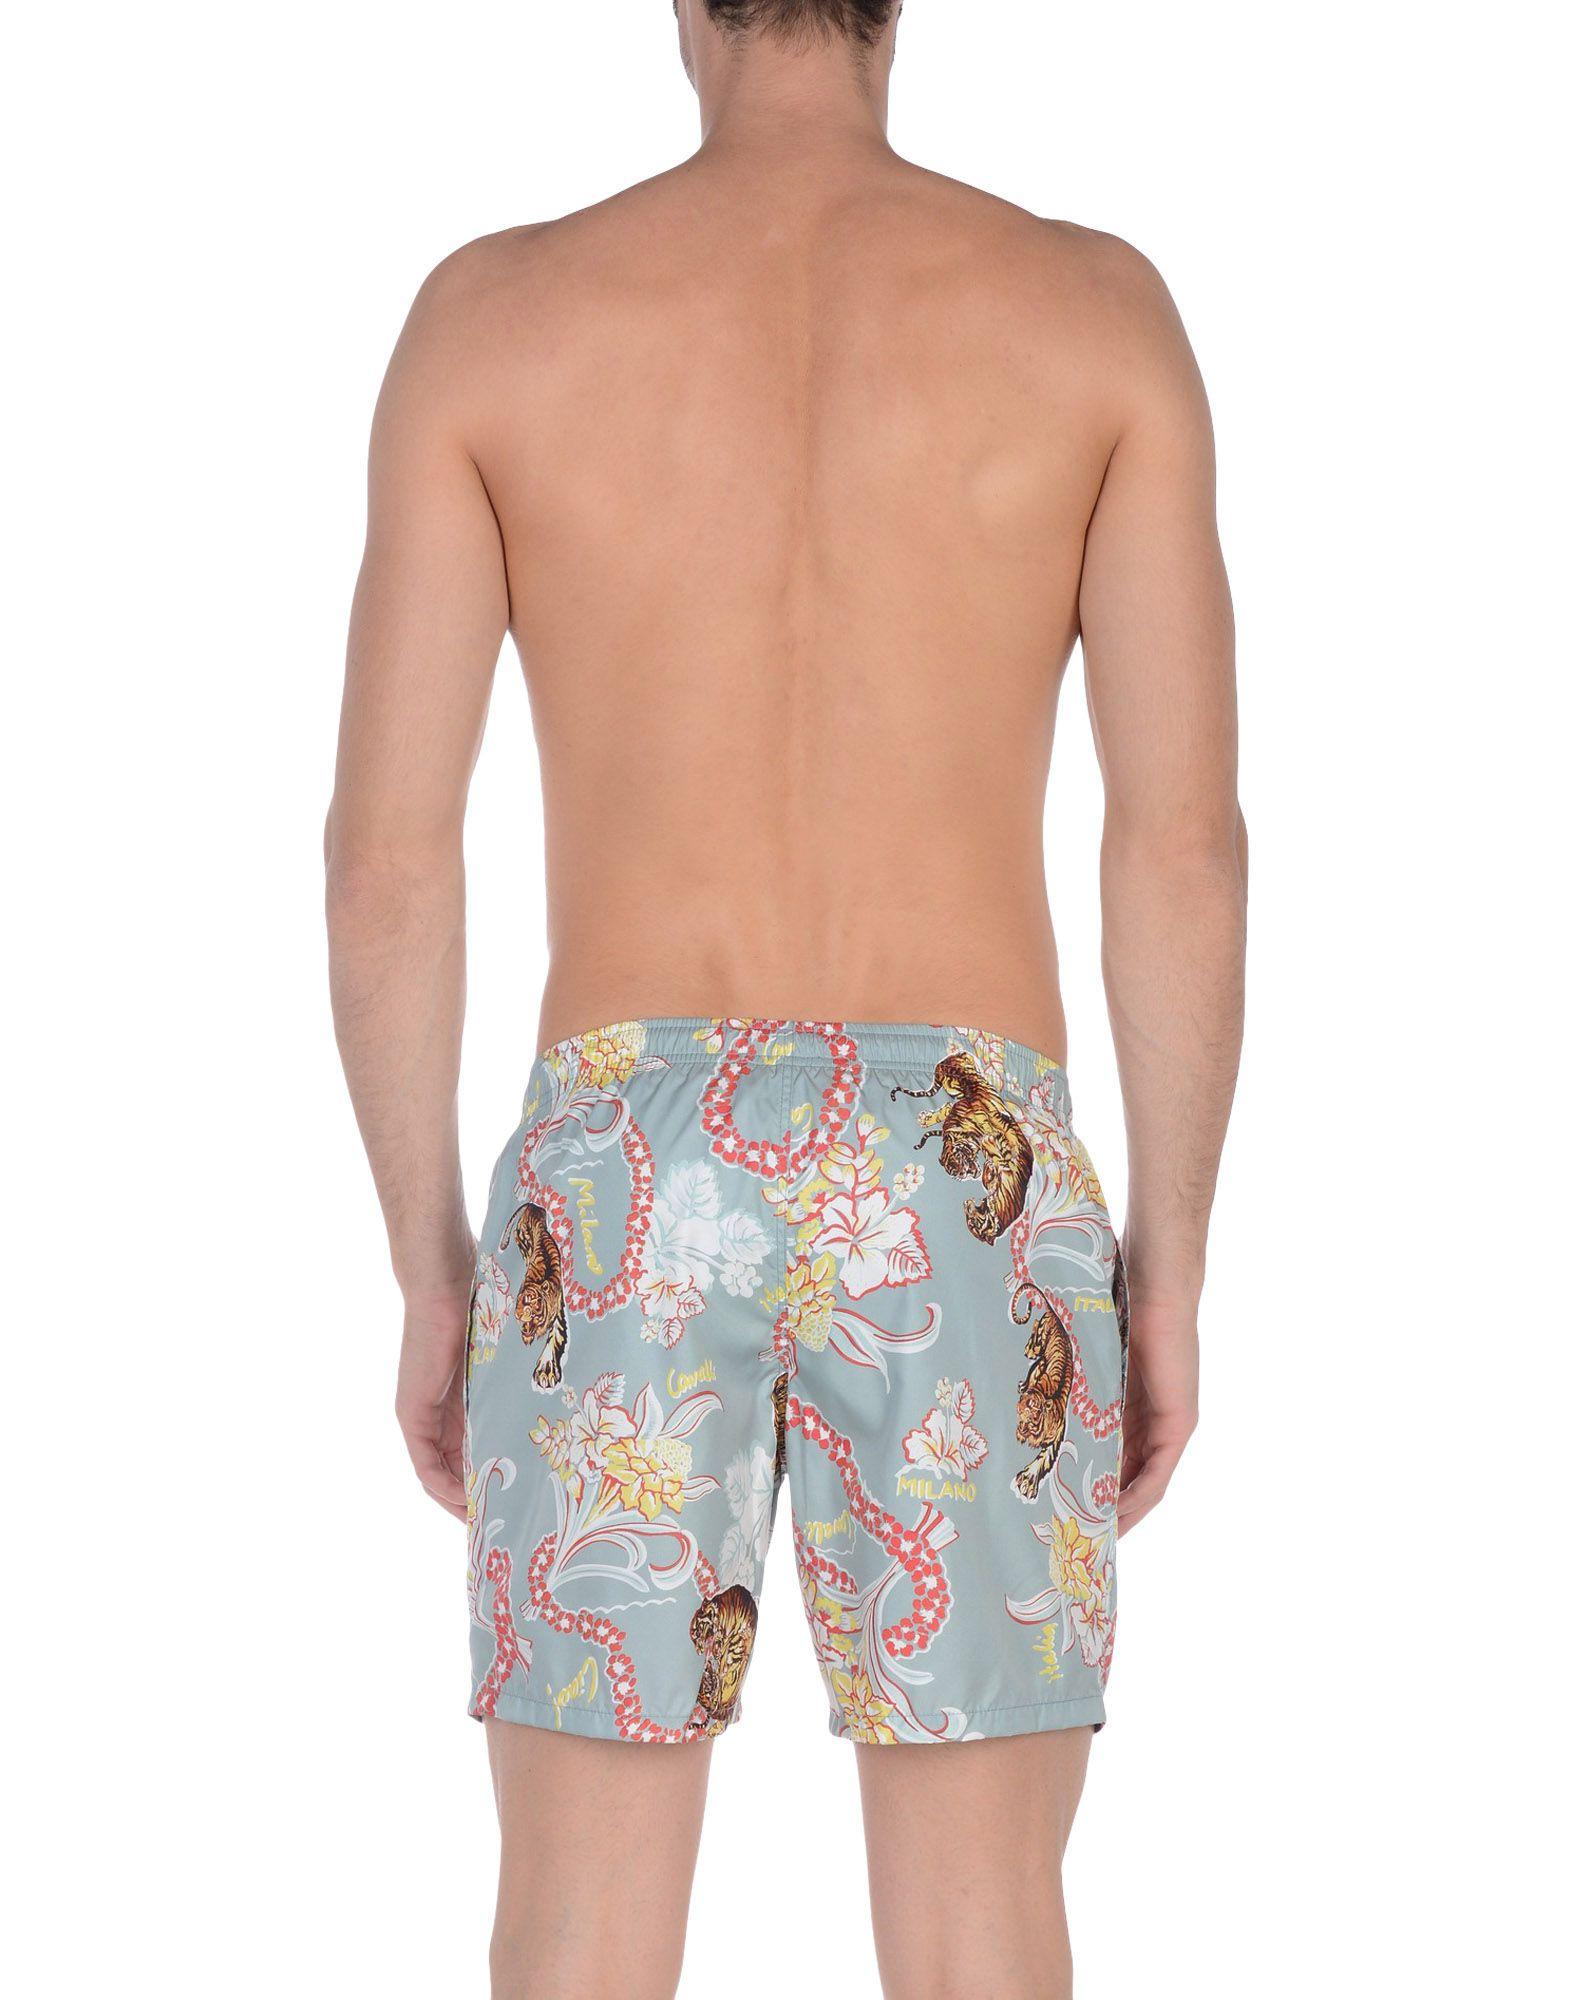 Boxer Mare Roberto Cavalli Beachwear Uomo 47209935RQ - 47209935RQ Uomo 22a3e5